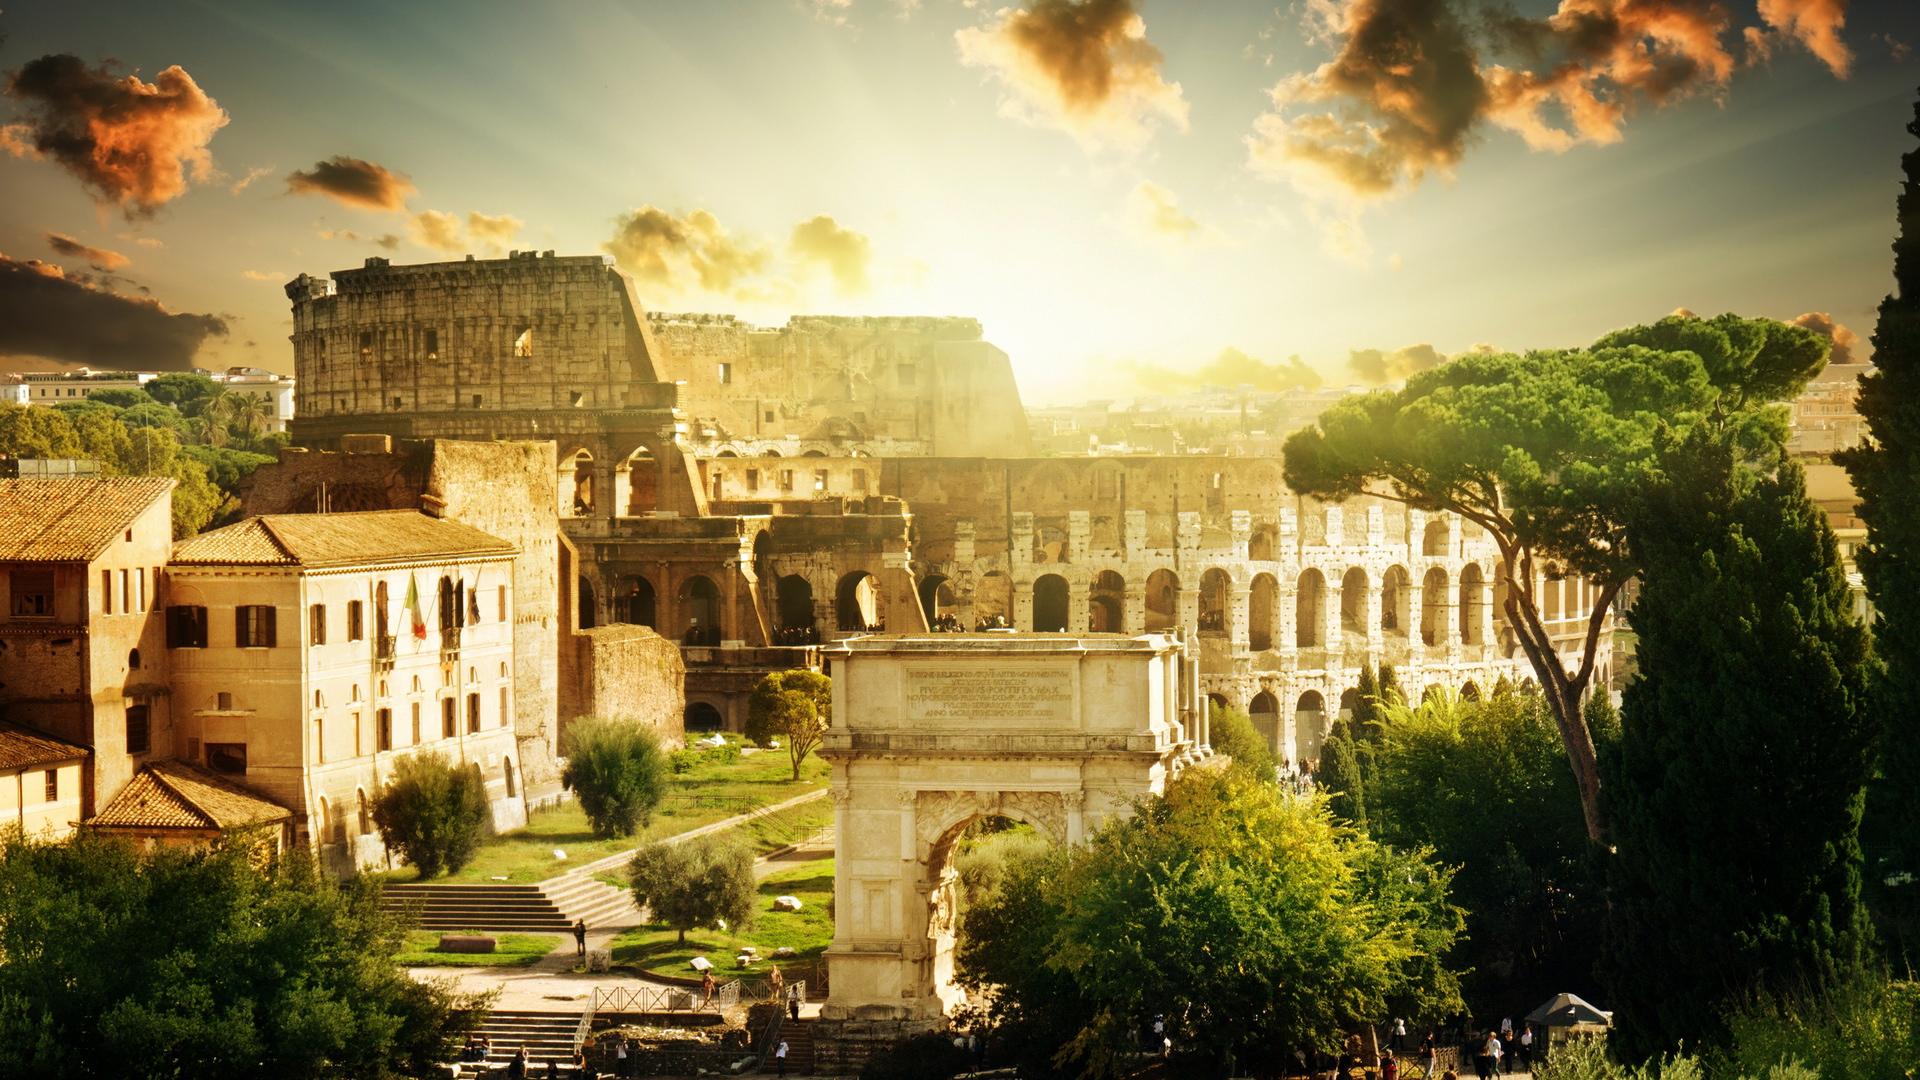 Roma wallpaper 1920x1080 209220 WallpaperUP 1920x1080